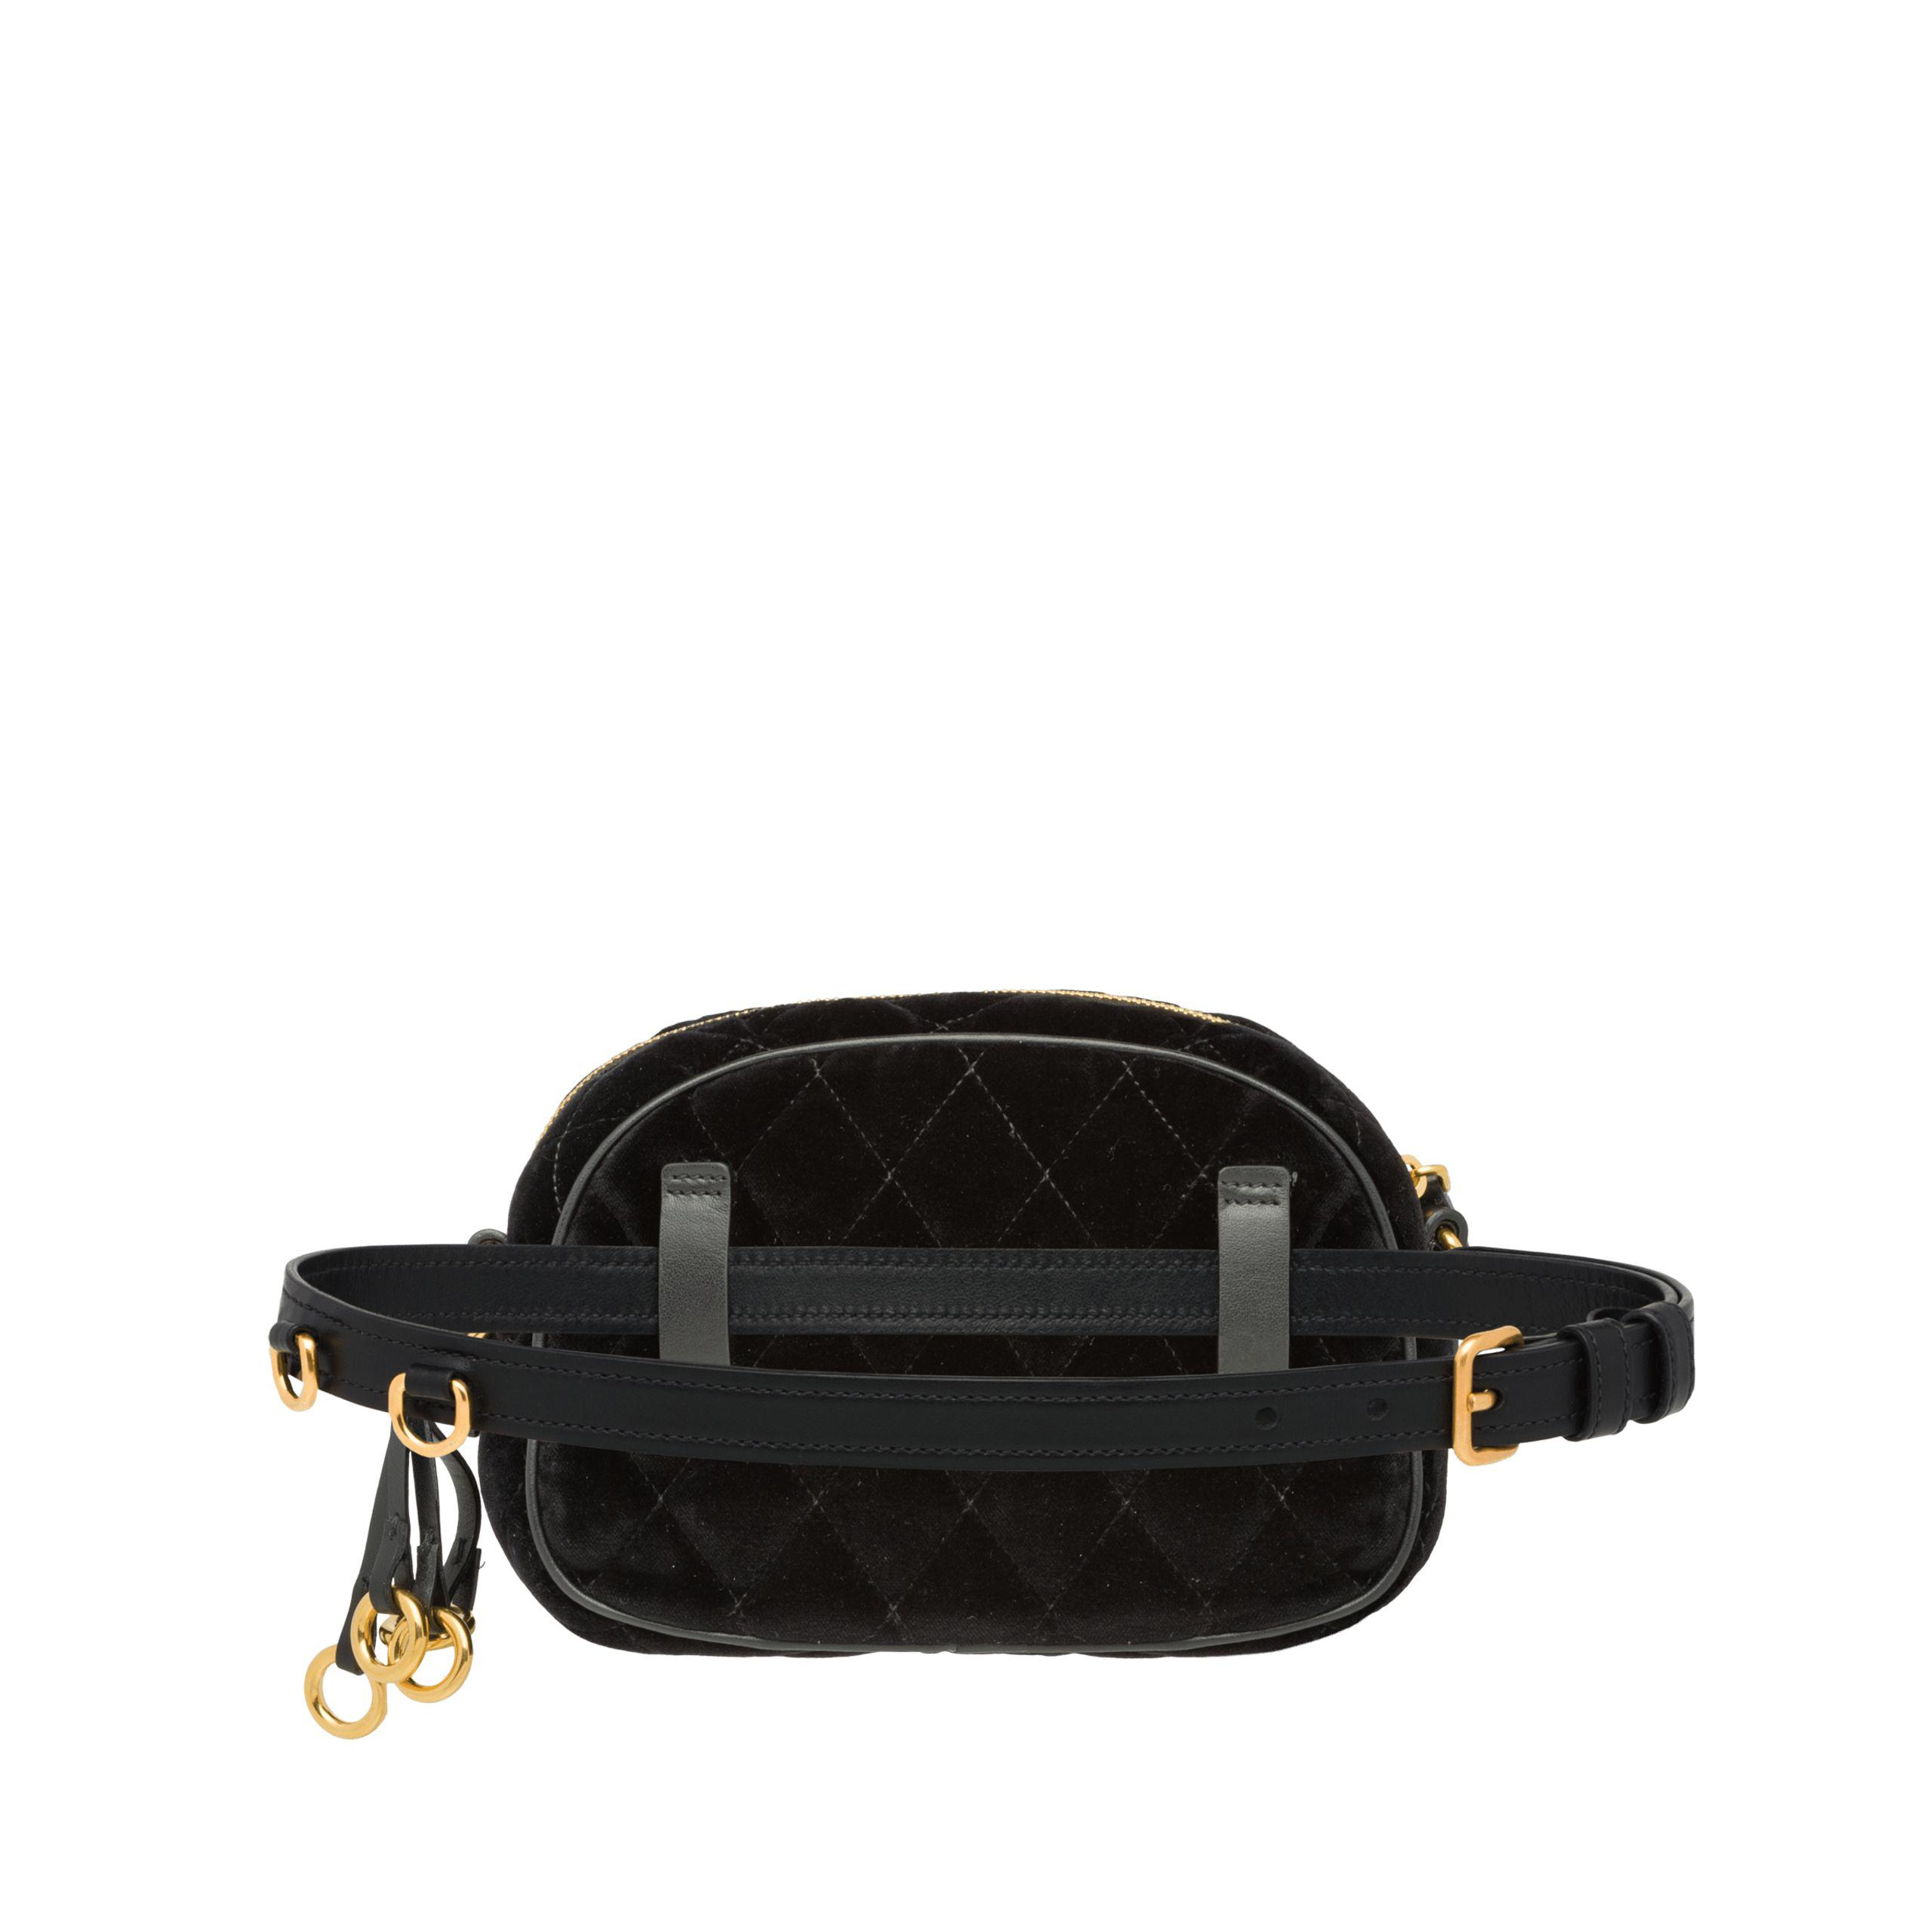 d704122259f2 Prada Corsaire Belt Bag in Black - Lyst